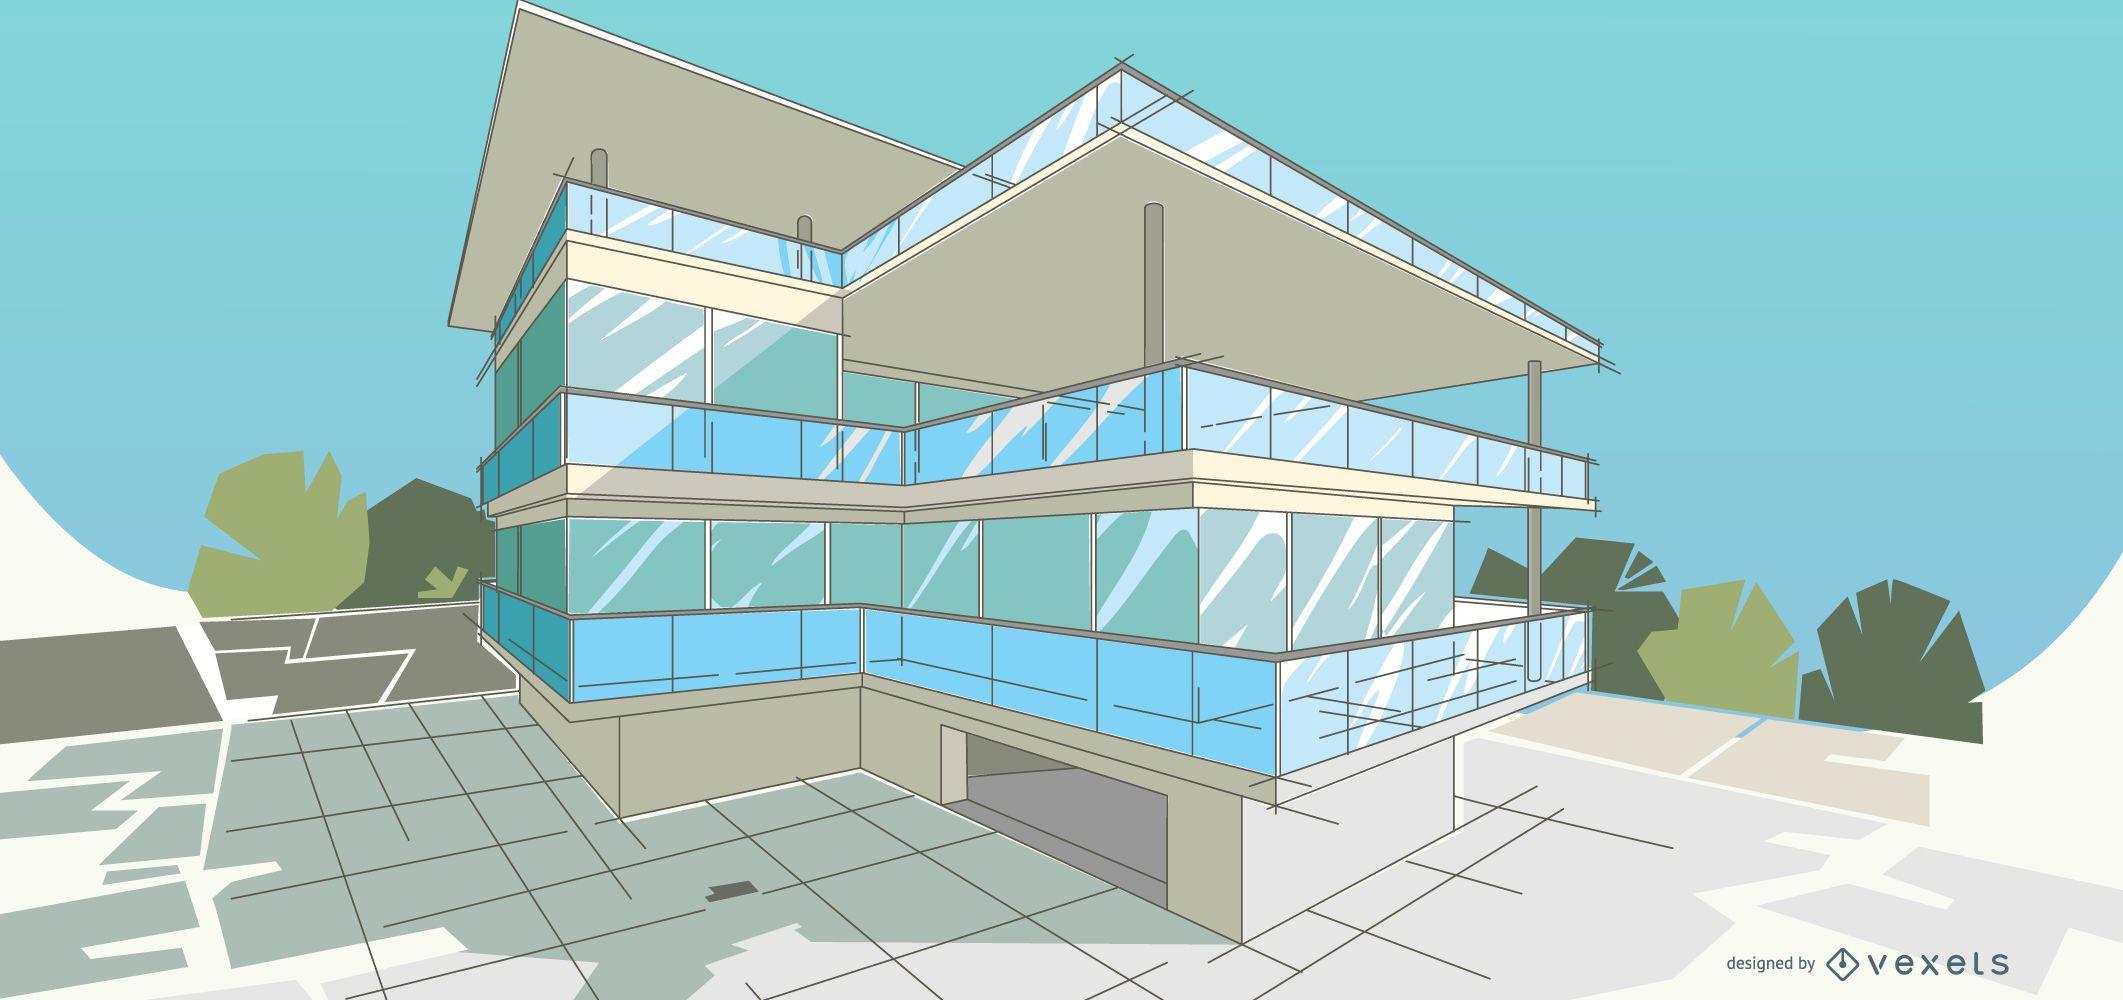 Architectural modern building illustration